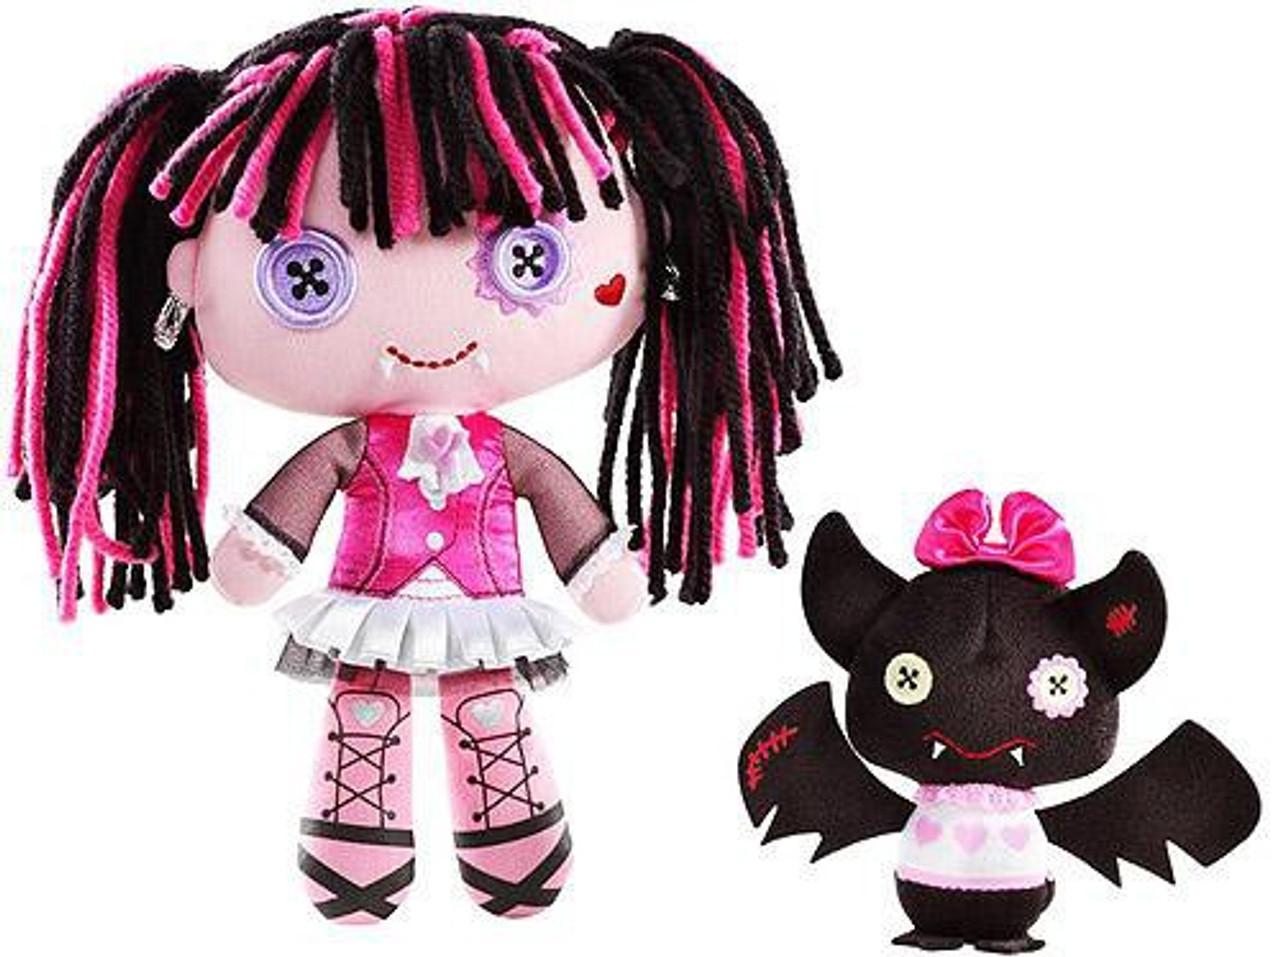 Monster High Friends Draculaura & Count Fabulous Plush Dolls